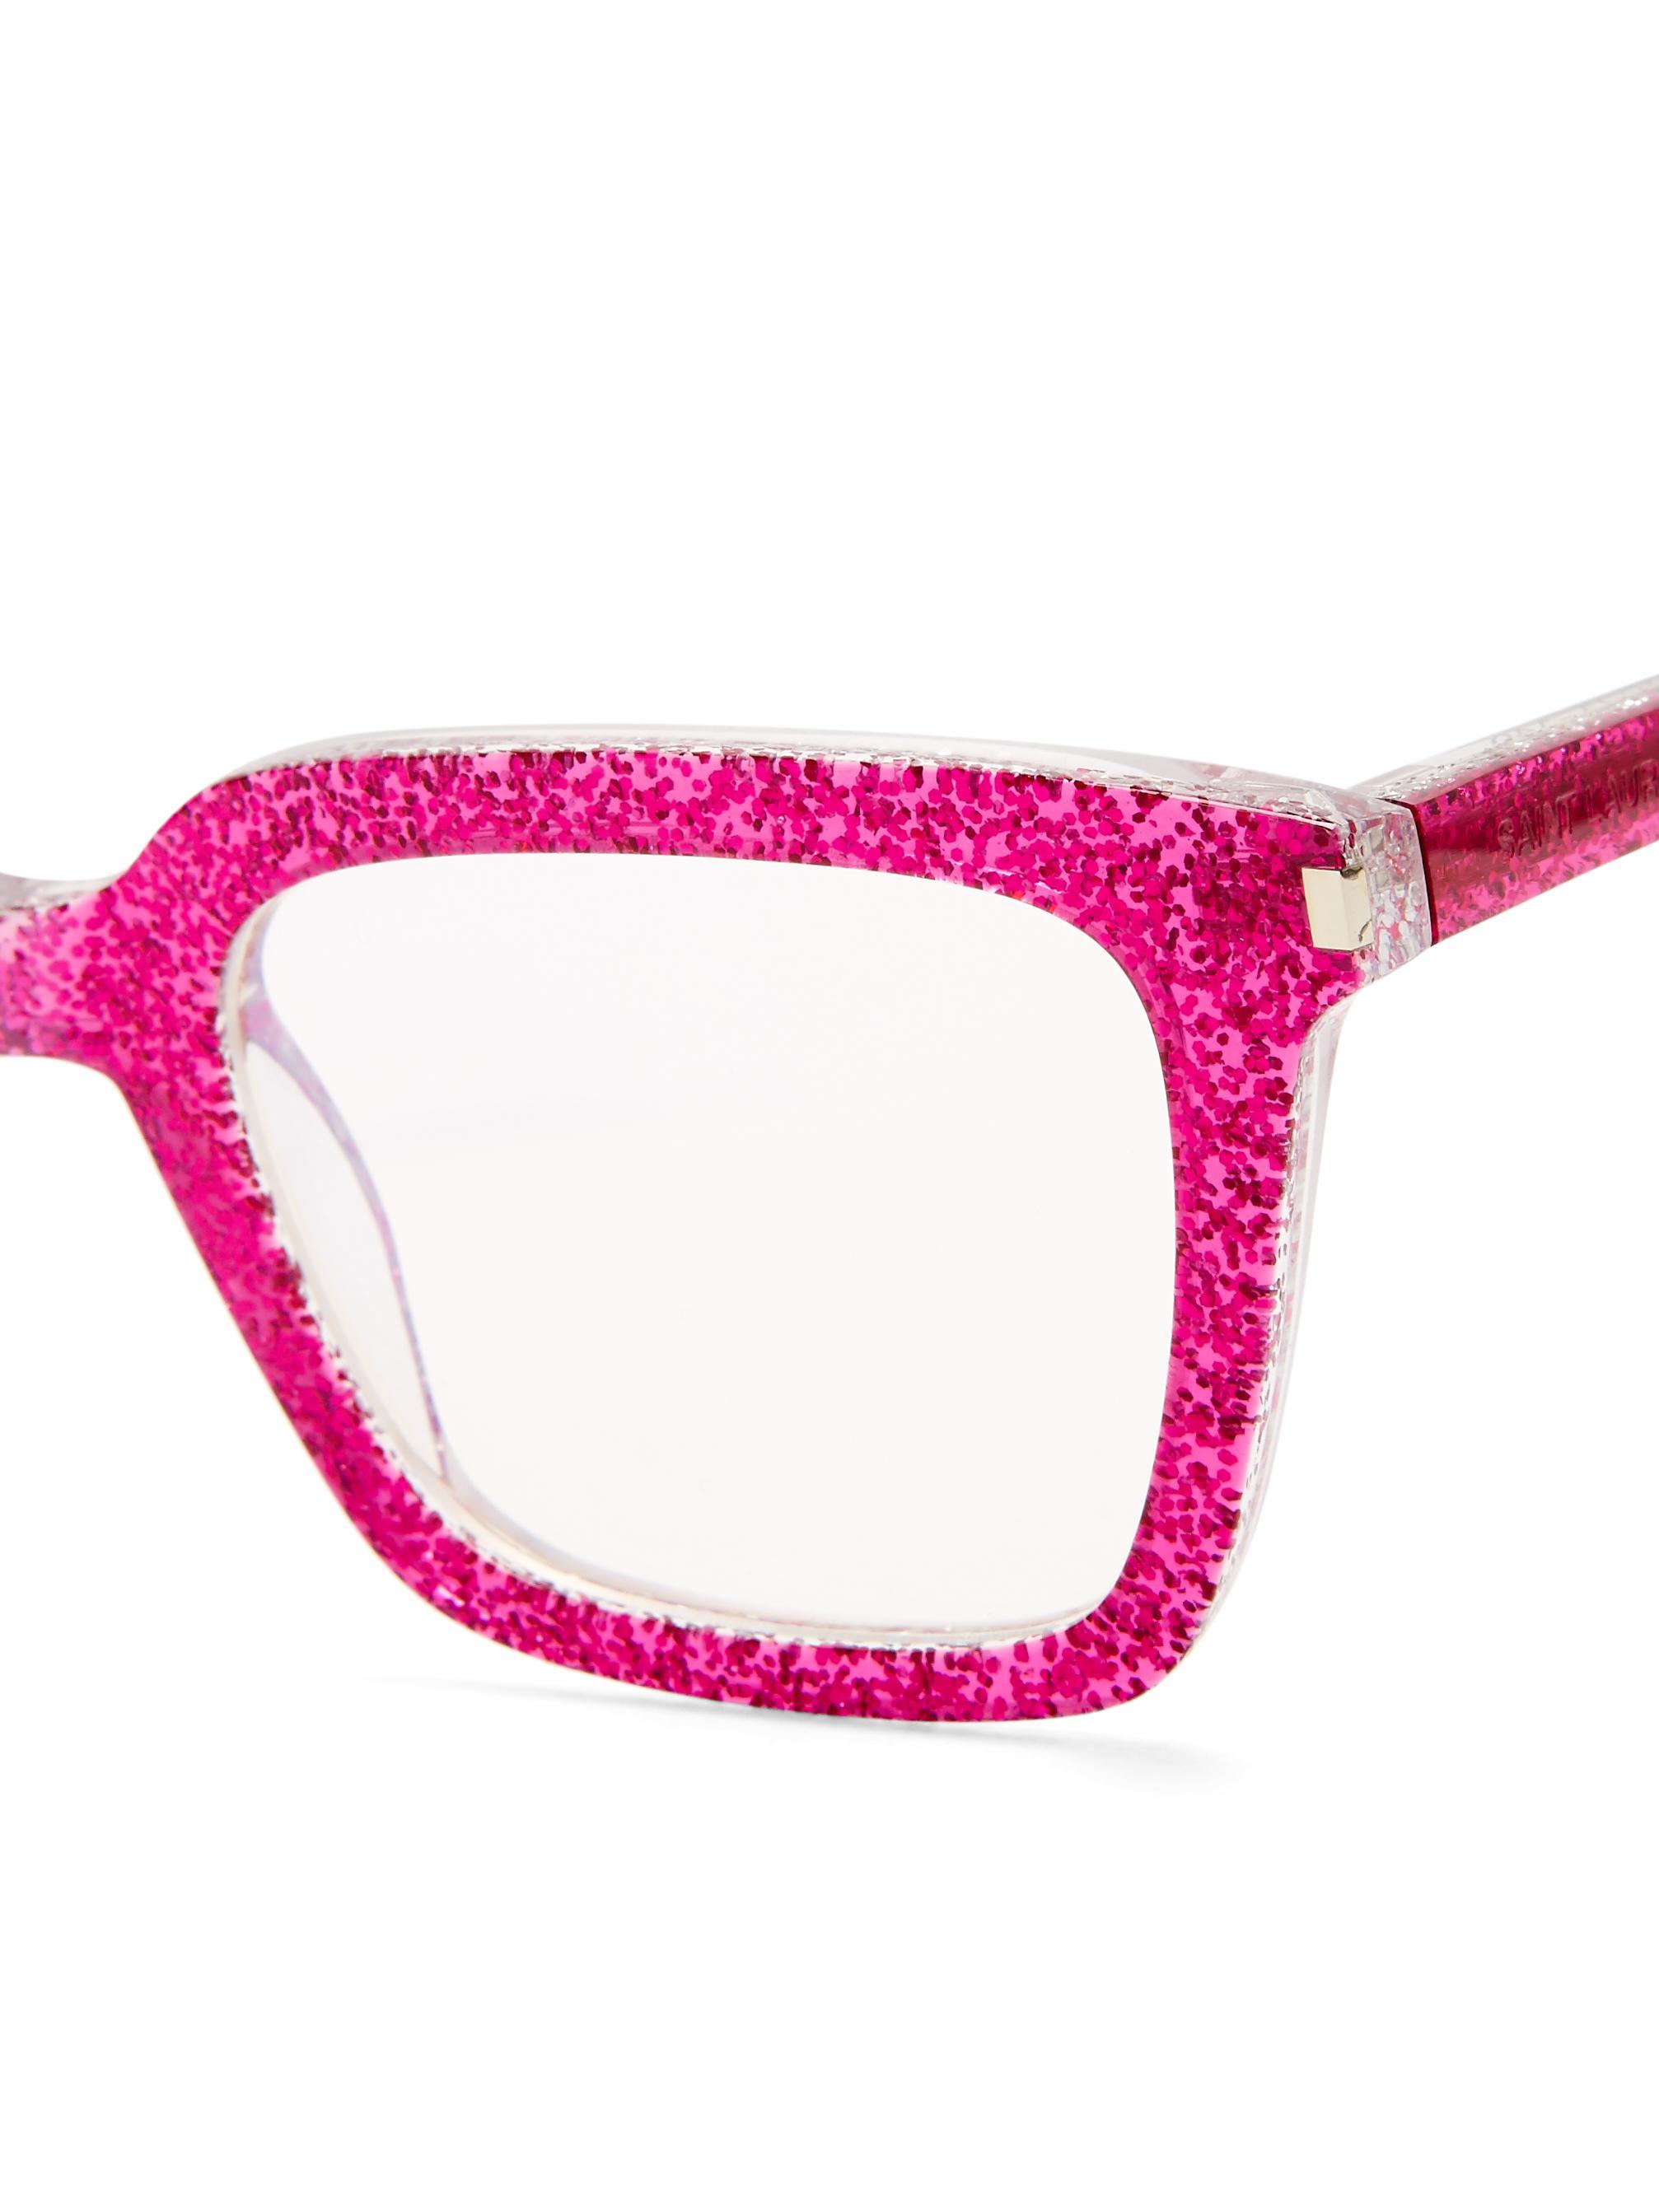 d690c9e889f Saint Laurent Rectangle-frame Glitter Sunglasses in Pink - Lyst